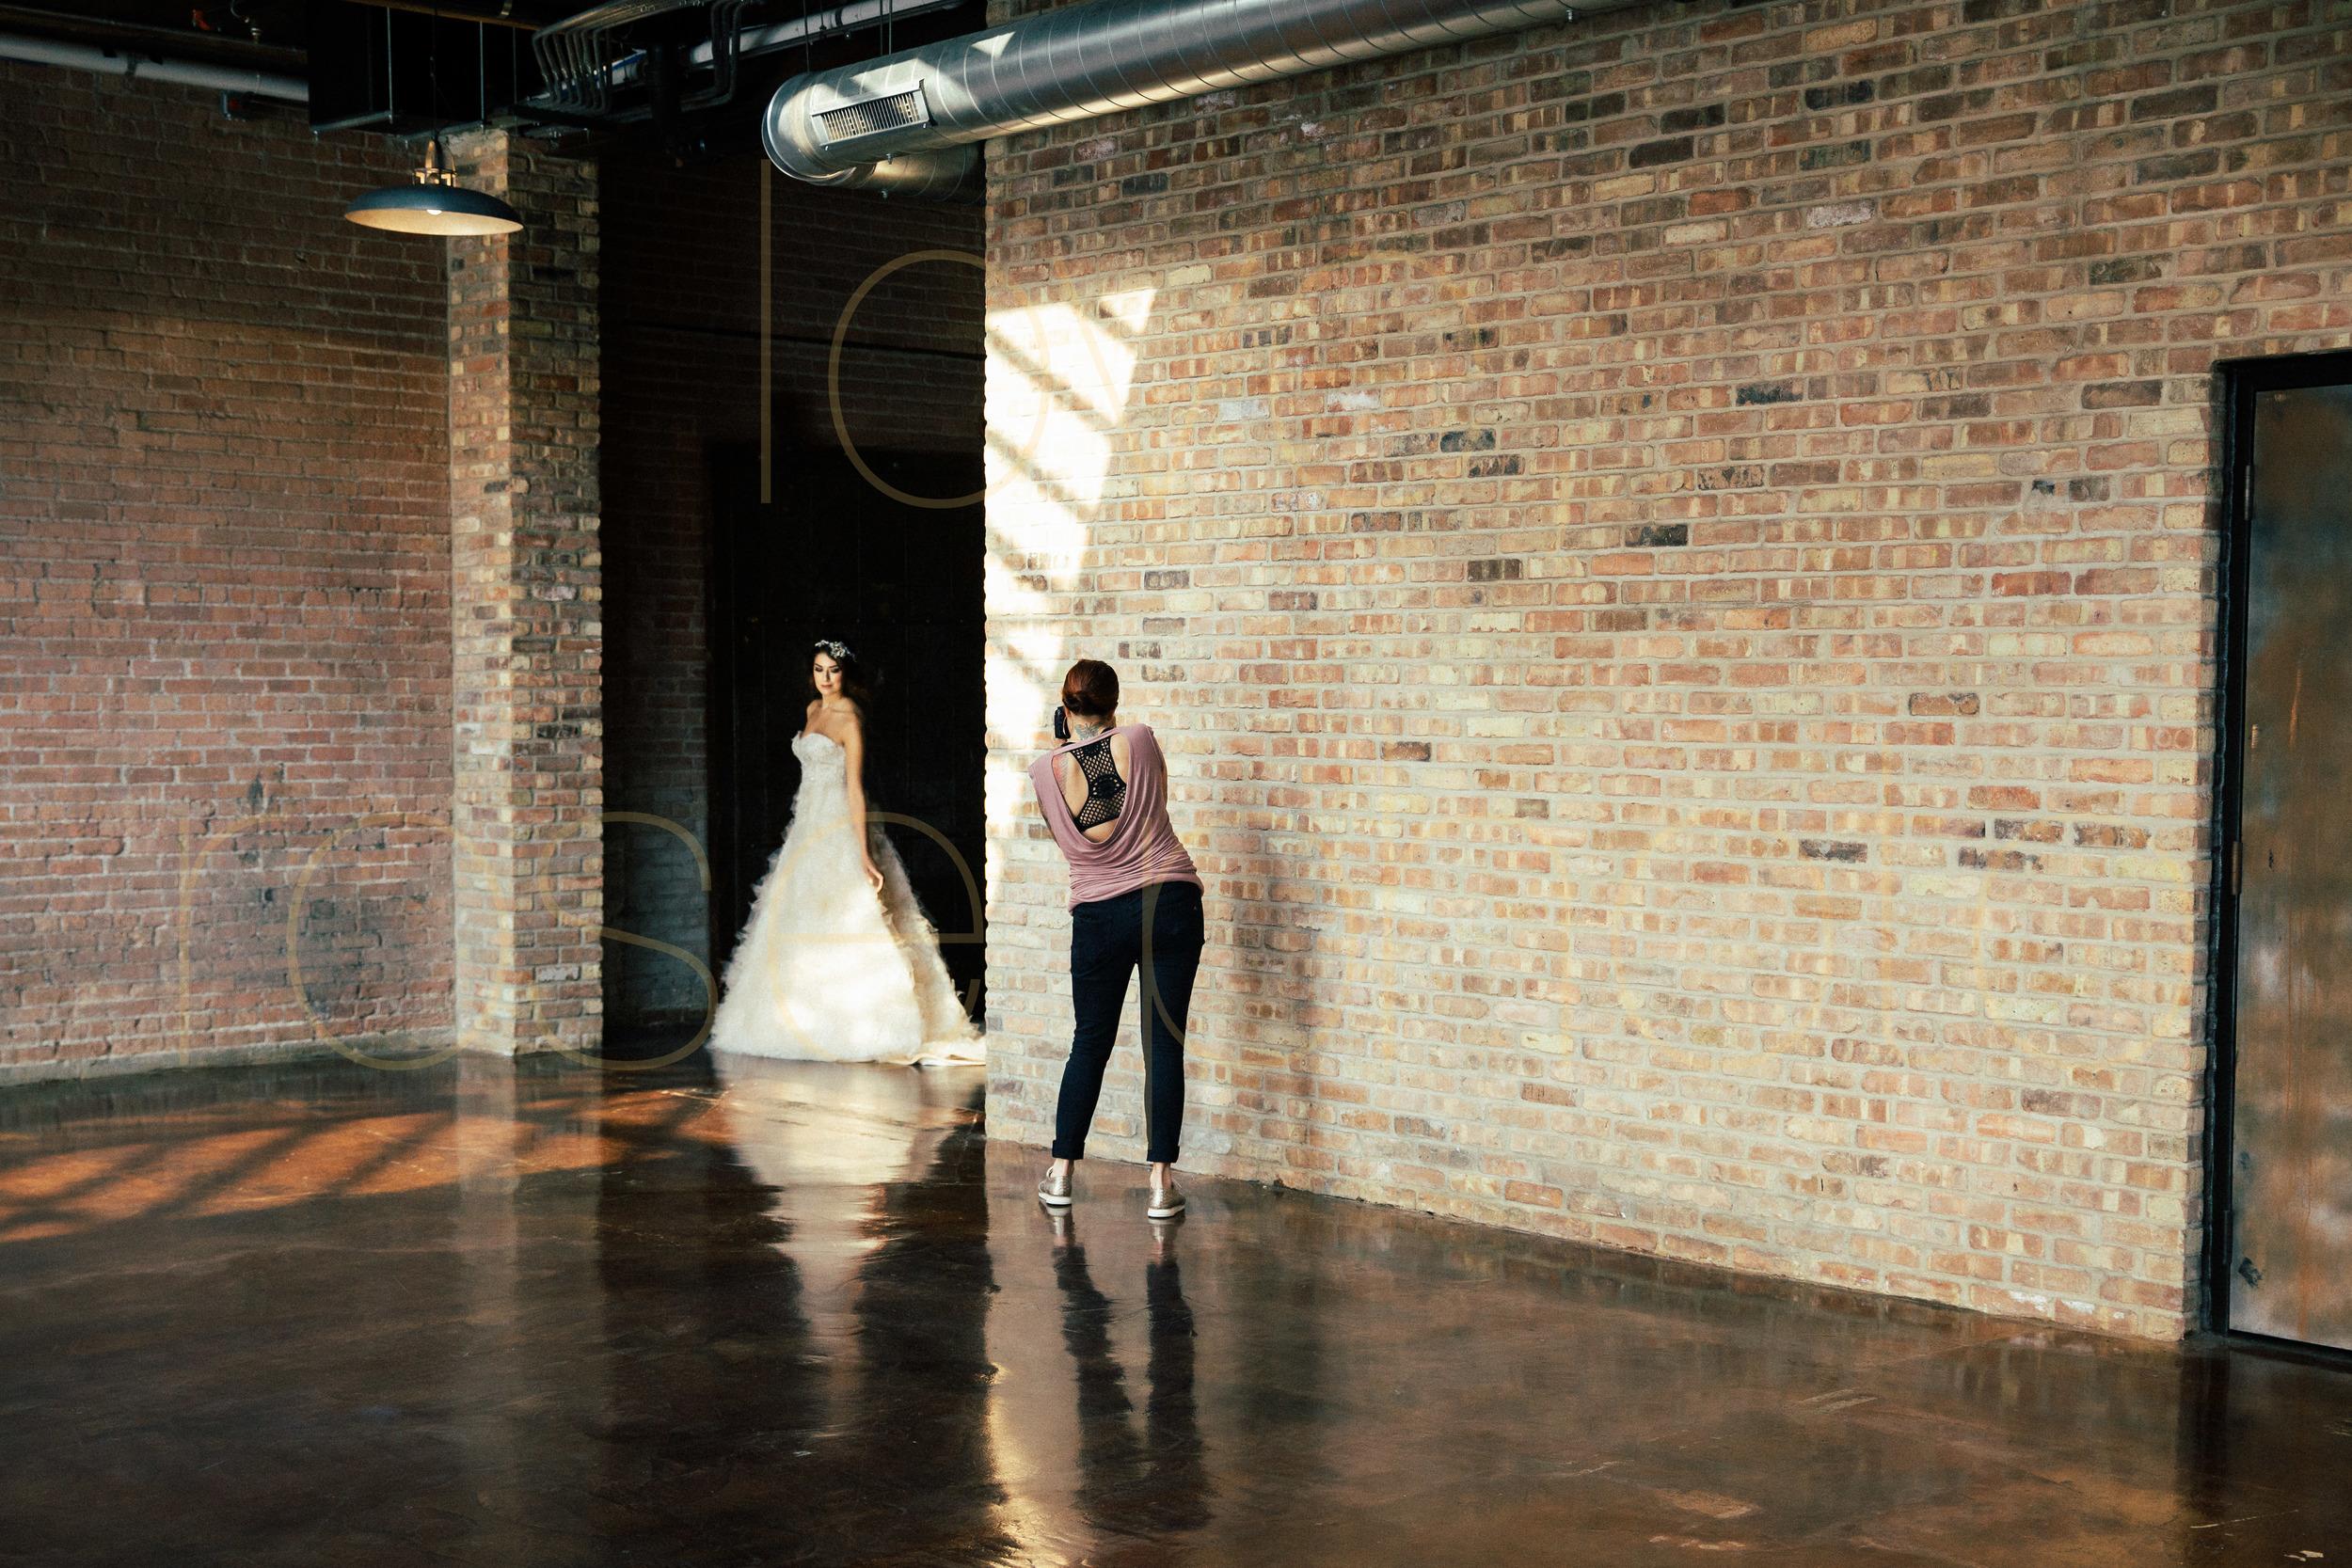 Morgan MFG West Loop Chicago Wedding Venue Photography Portrait Photographer -15.jpg